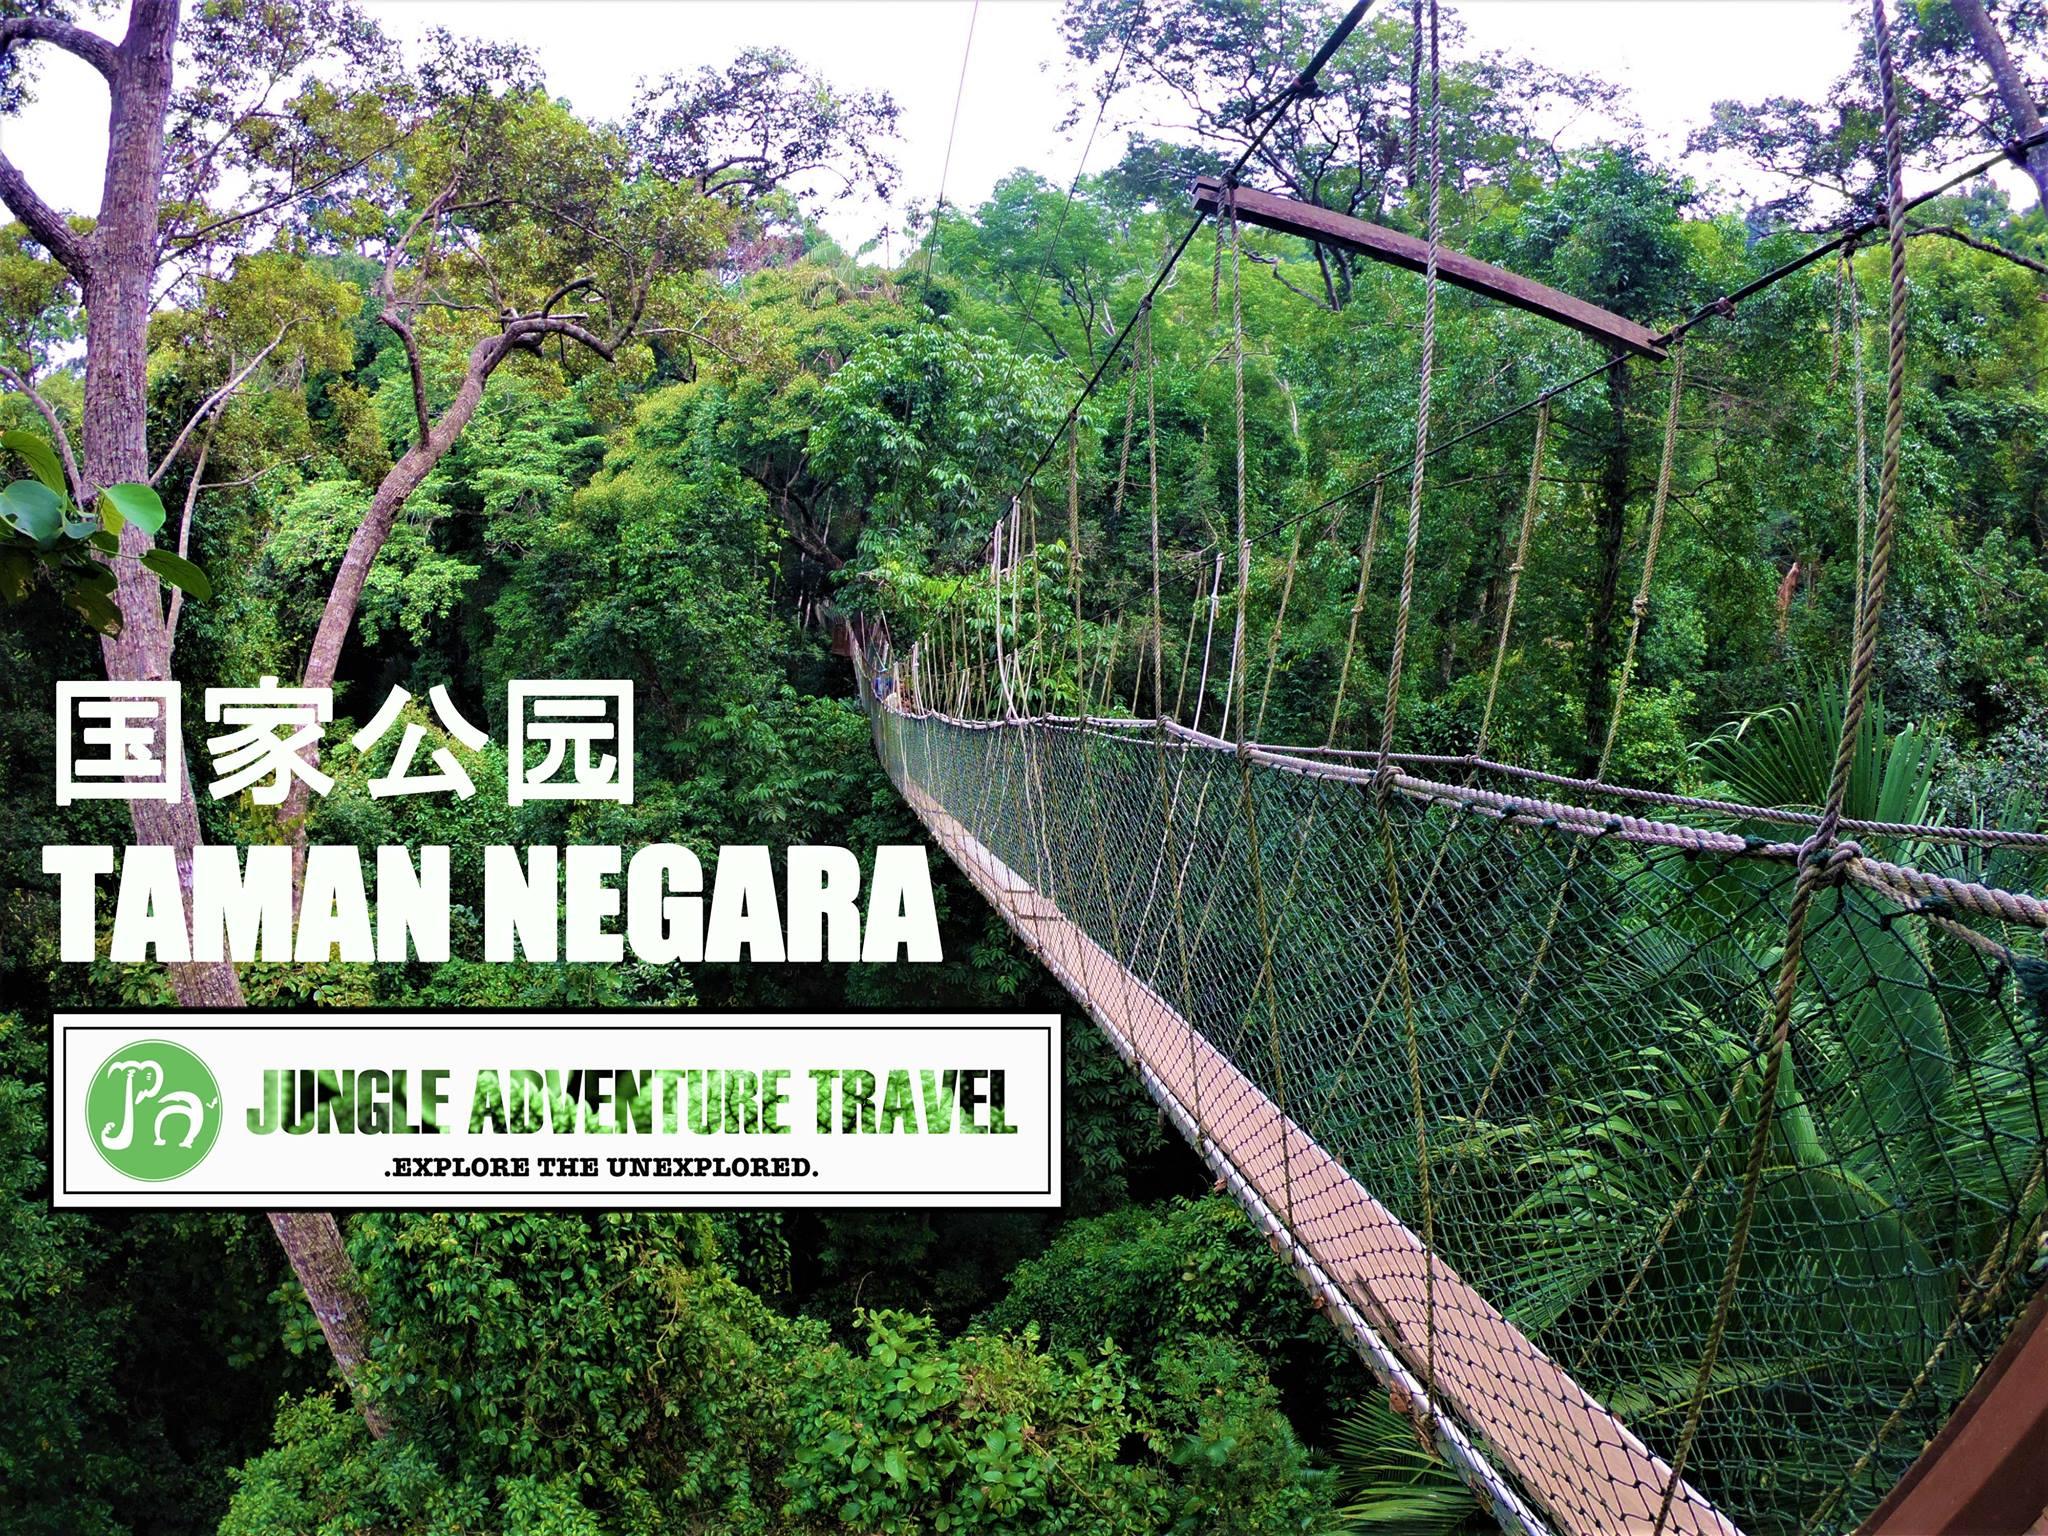 Jungle Adventure Travel